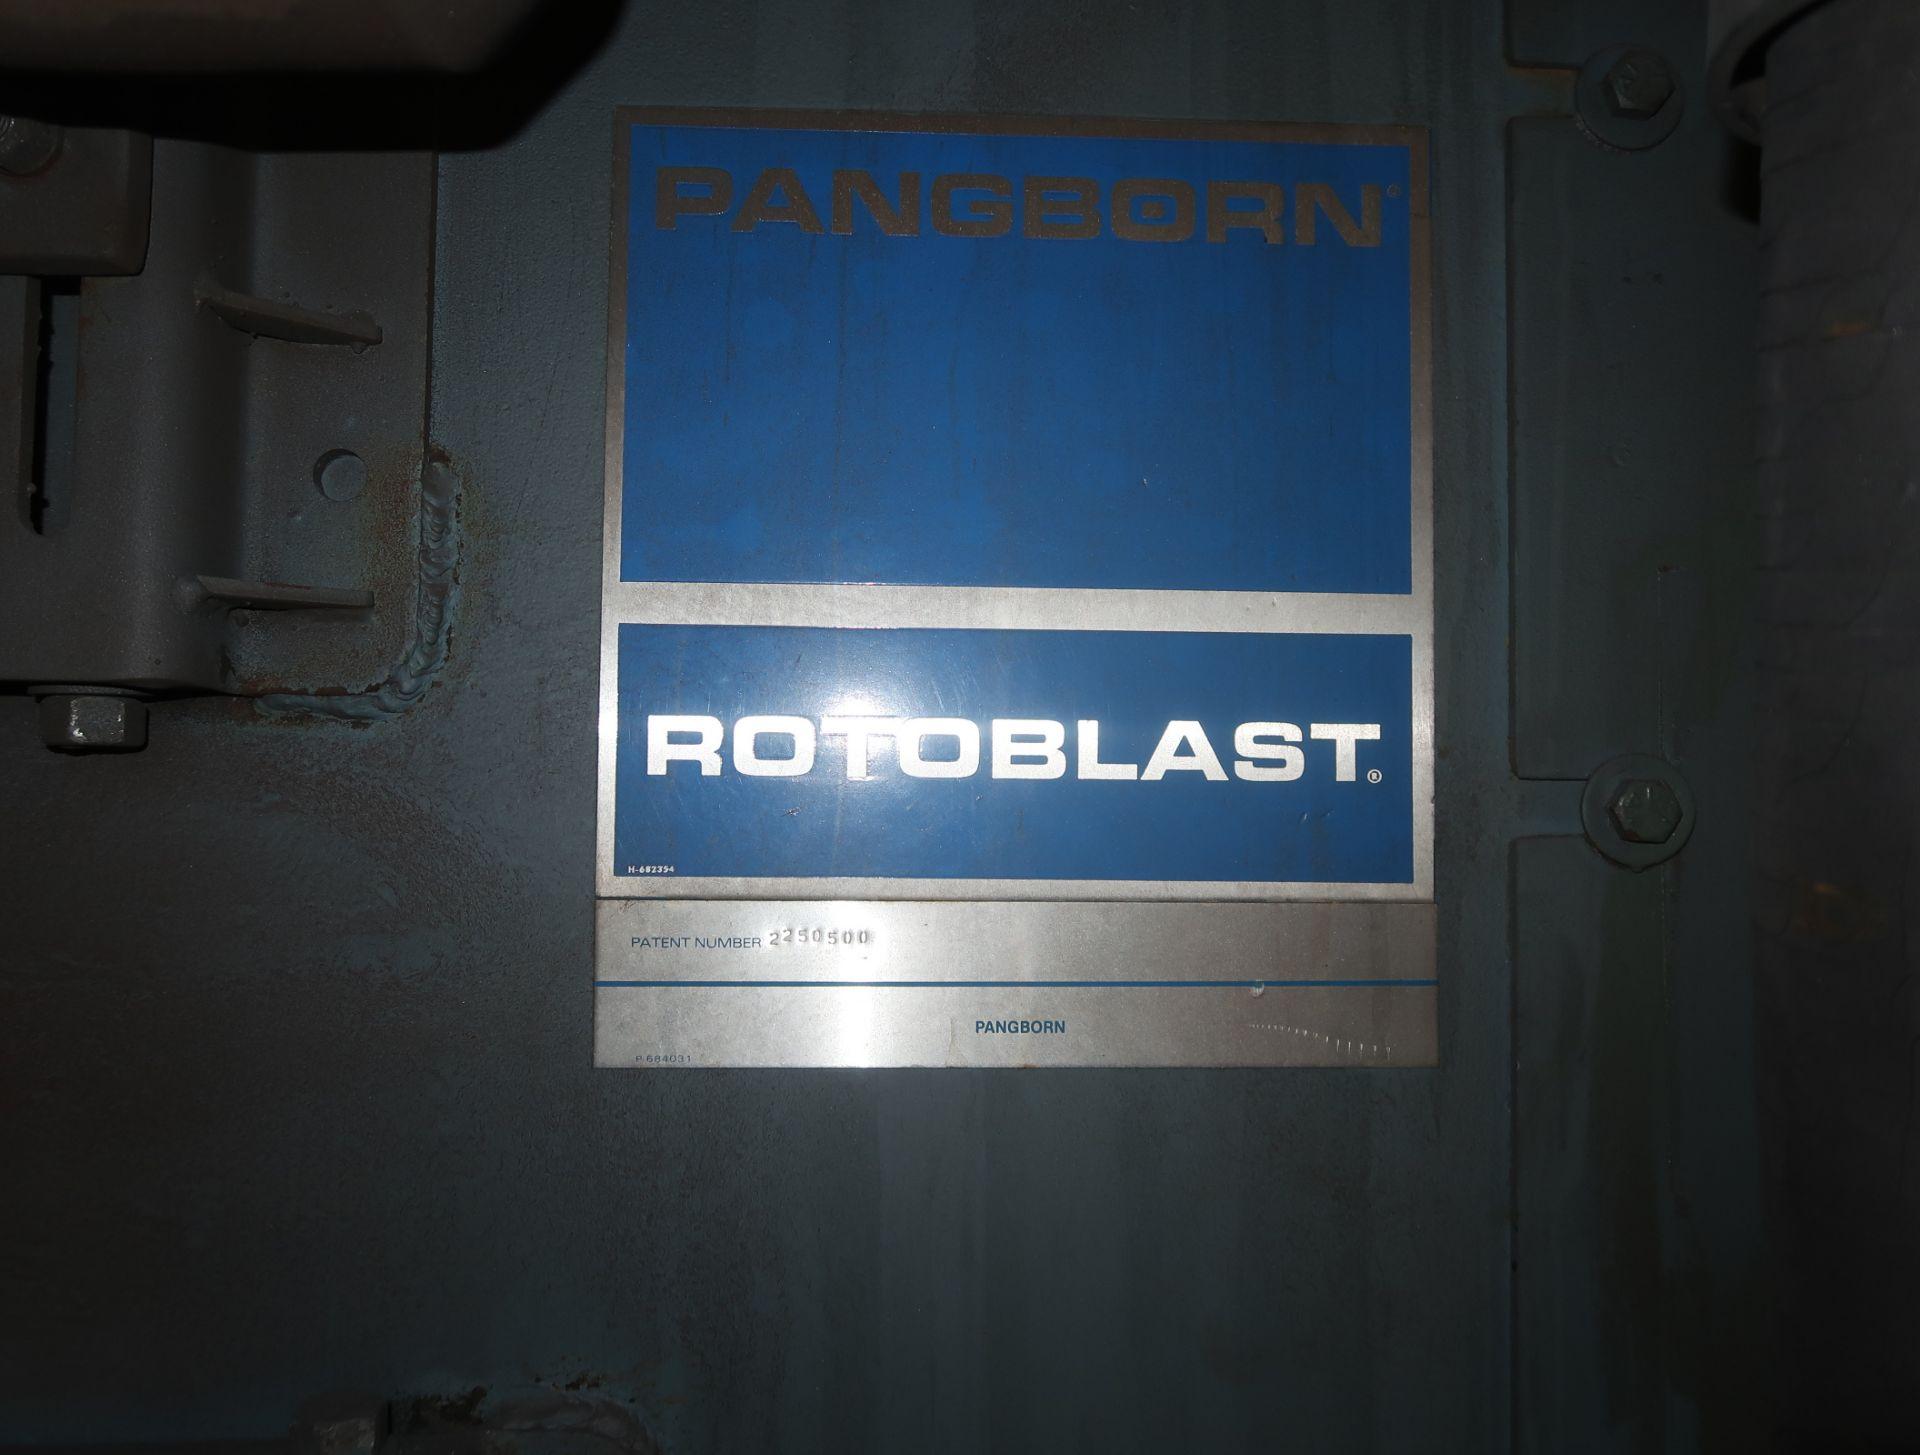 Lot 42 - PANGBORN RK ROTO BLAST WHEELABRATOR W/ TORIT DUST COLLECTOR MDL. ES-1838 SN. ES-1838-6-8626